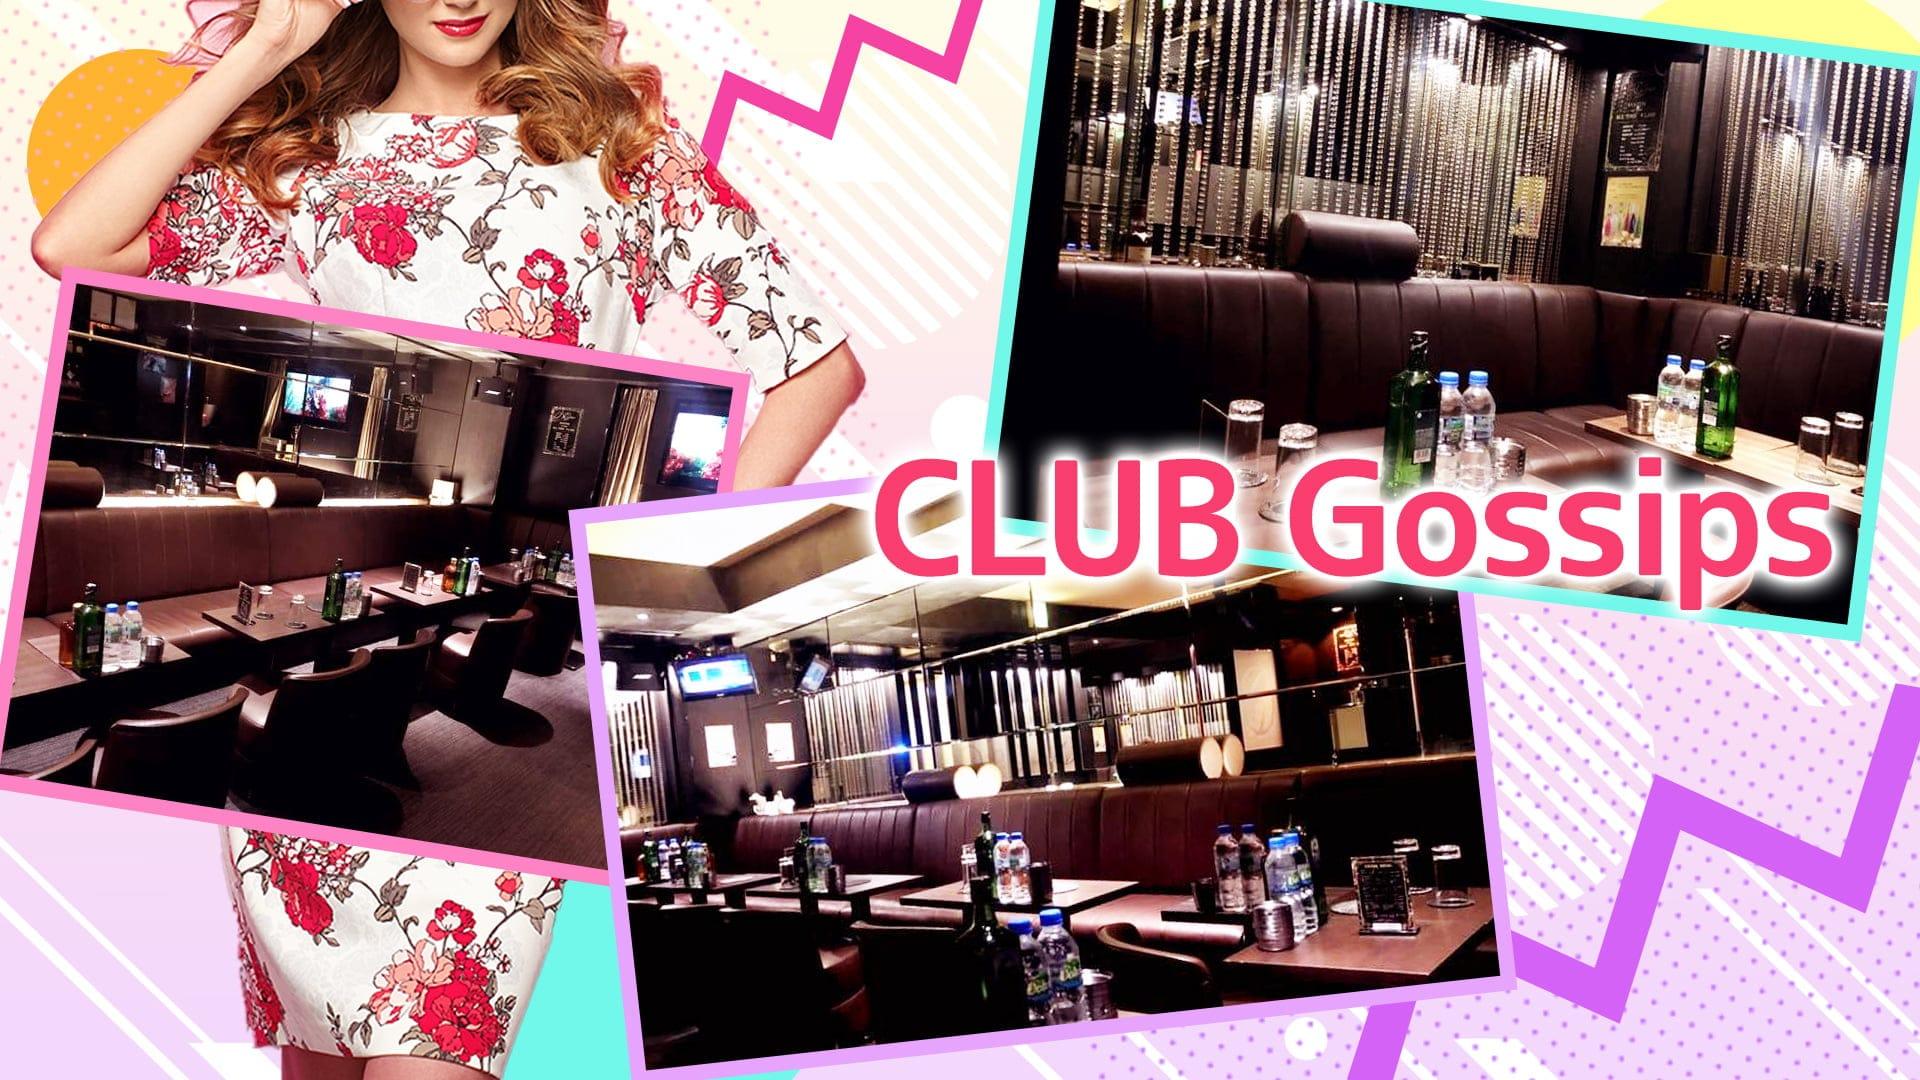 Club Gossips(ゴシップス) 池袋ラウンジ TOP画像